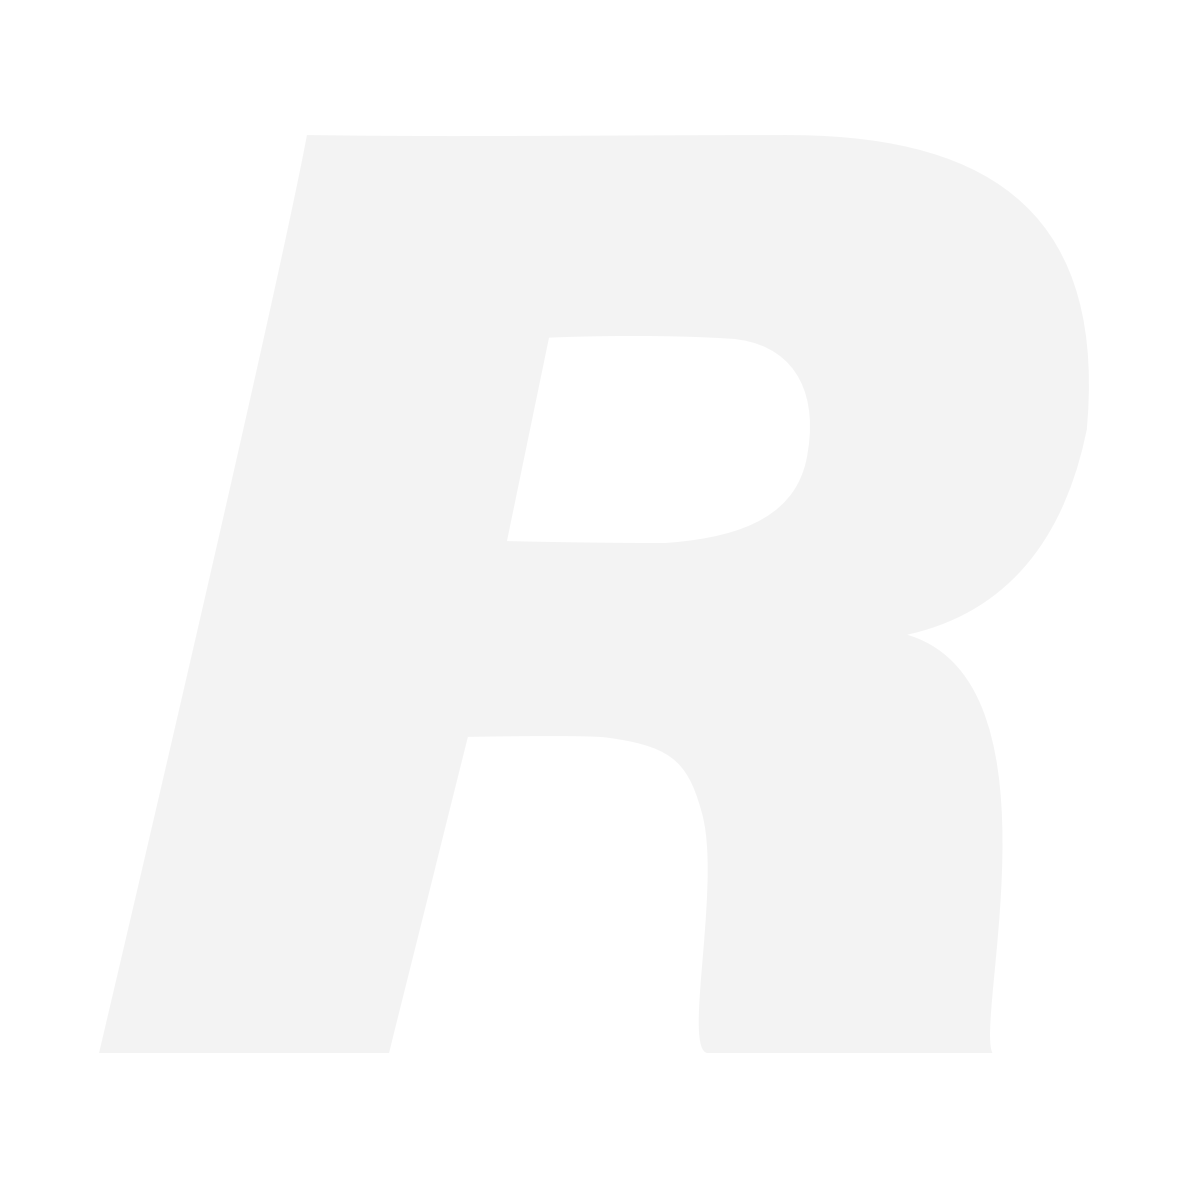 AXPRO 67MM DIGITAL WIDE ANGLE LENS (Laajakulma-/macrolisäke) KÄYTETTY